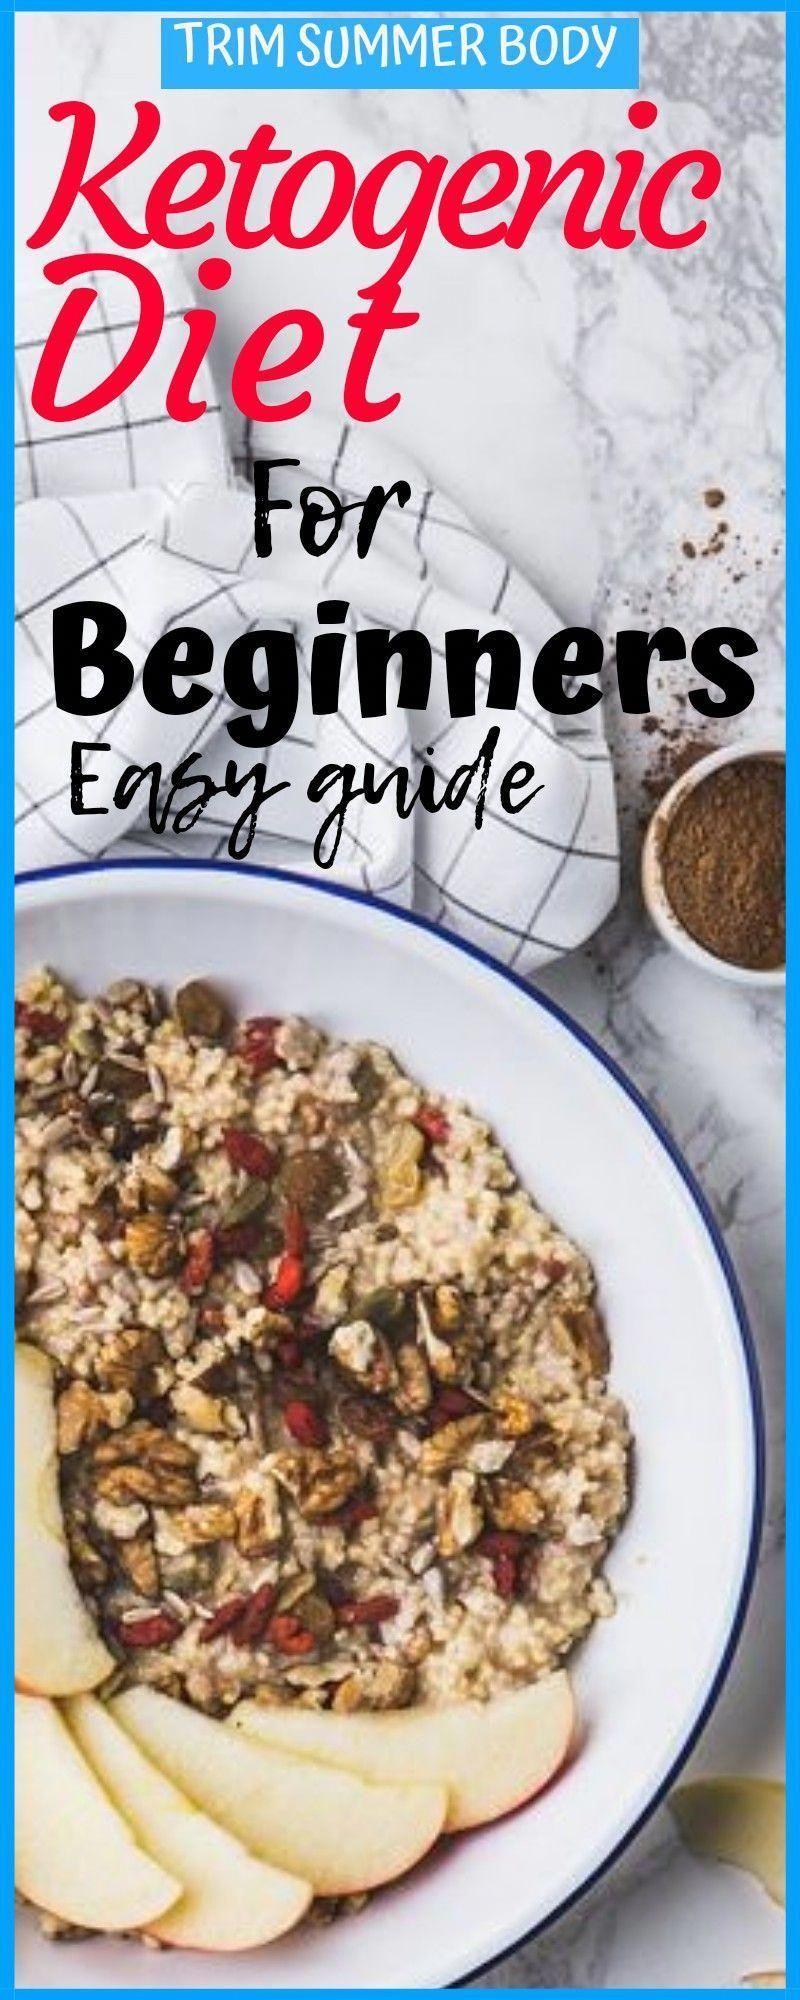 #beginnersketogenic #forketogenic #dietrecipes #ketogenic #beginners #nutrition #fitness #health #di...